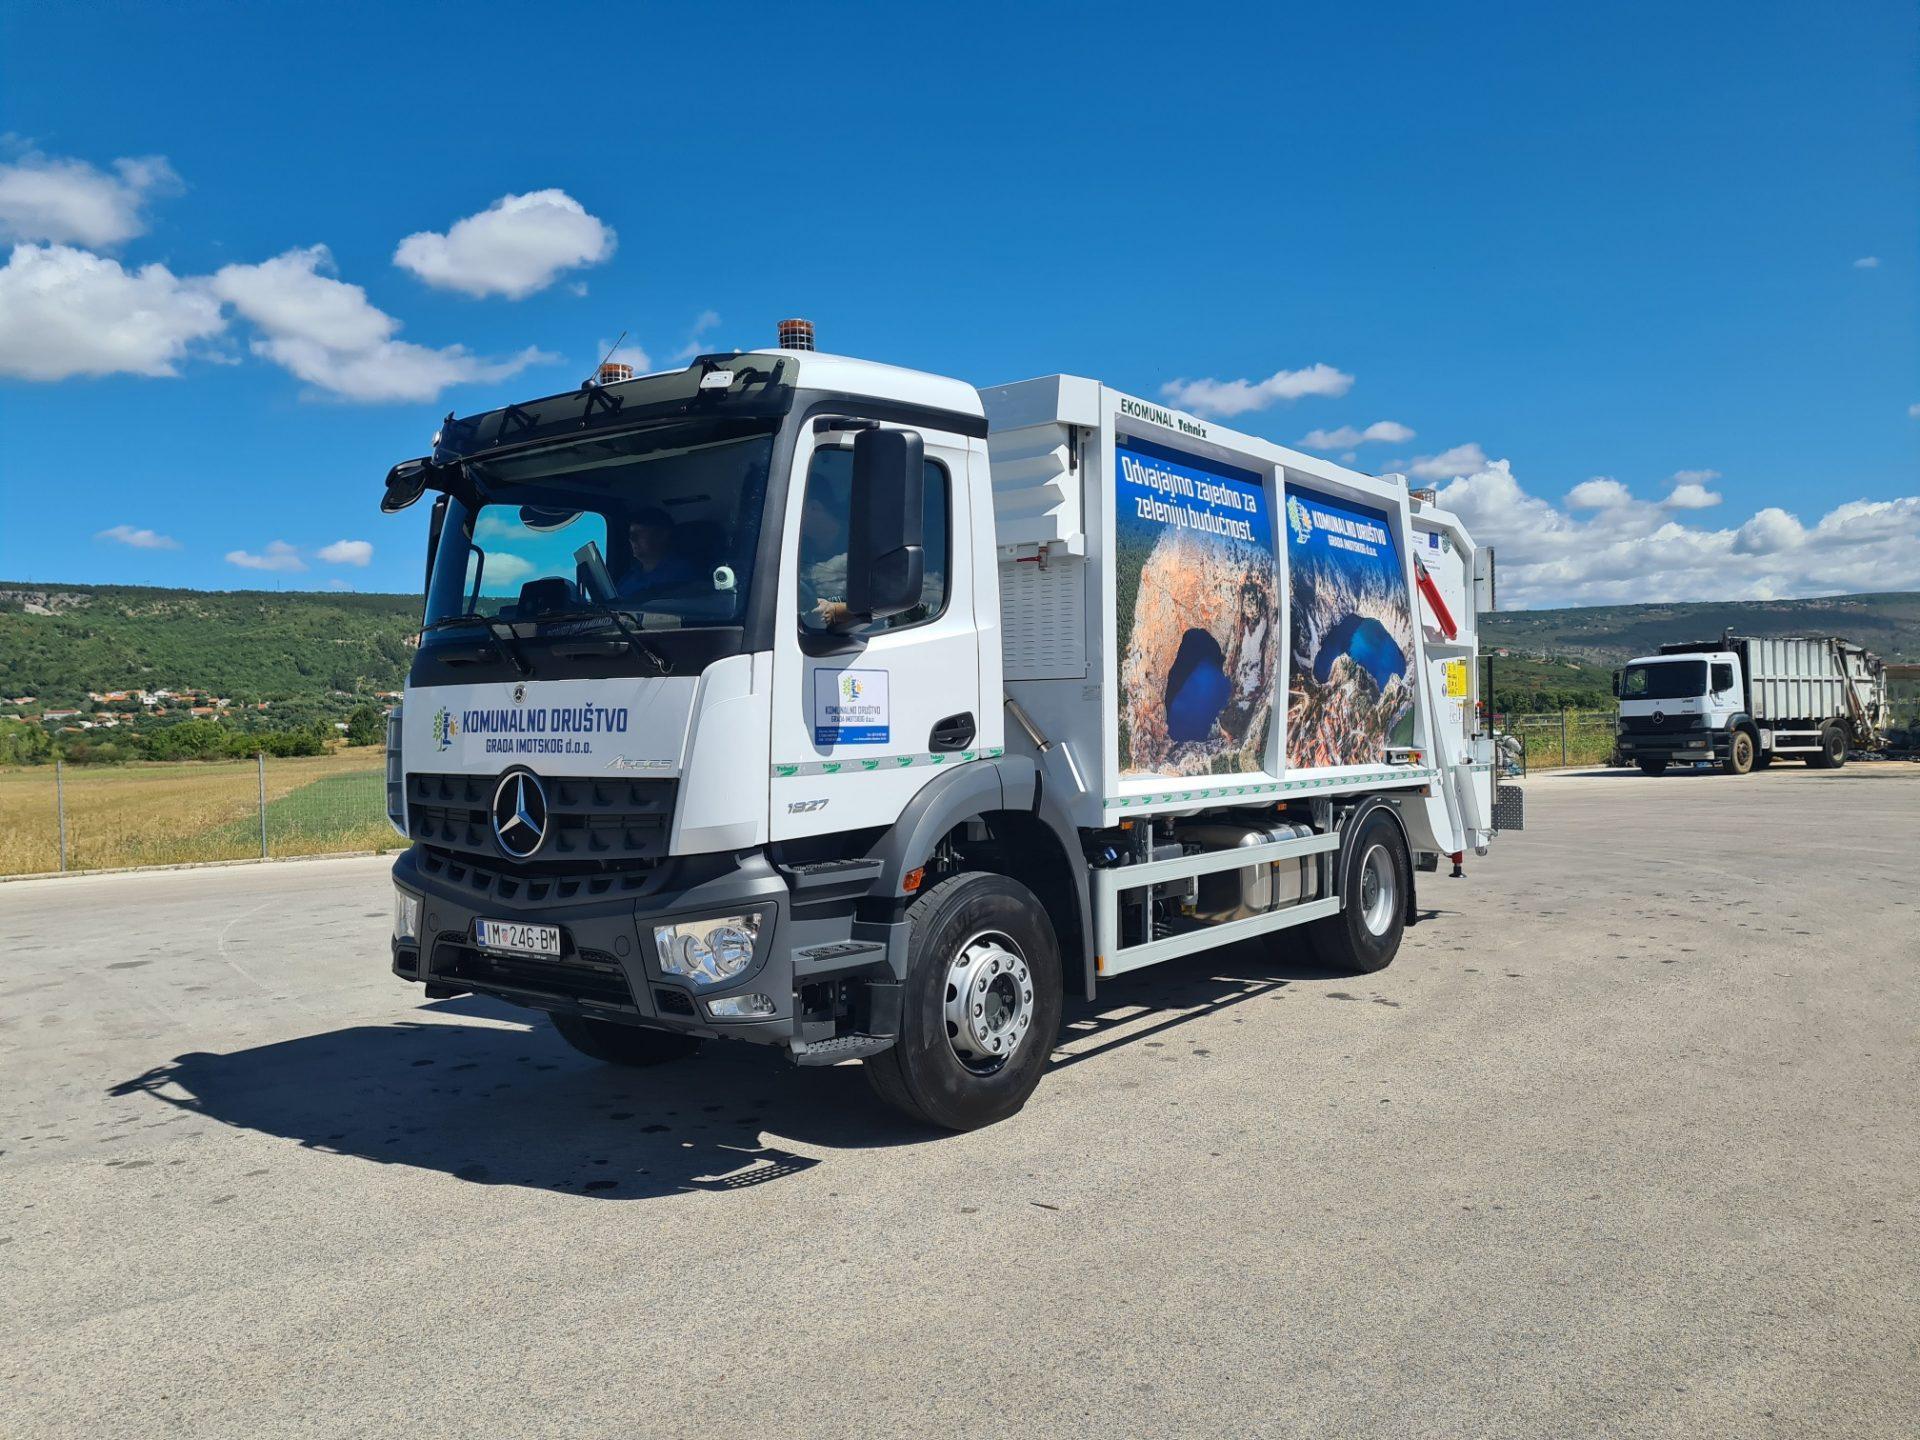 Imotski dobio novo Komunalno vozilo